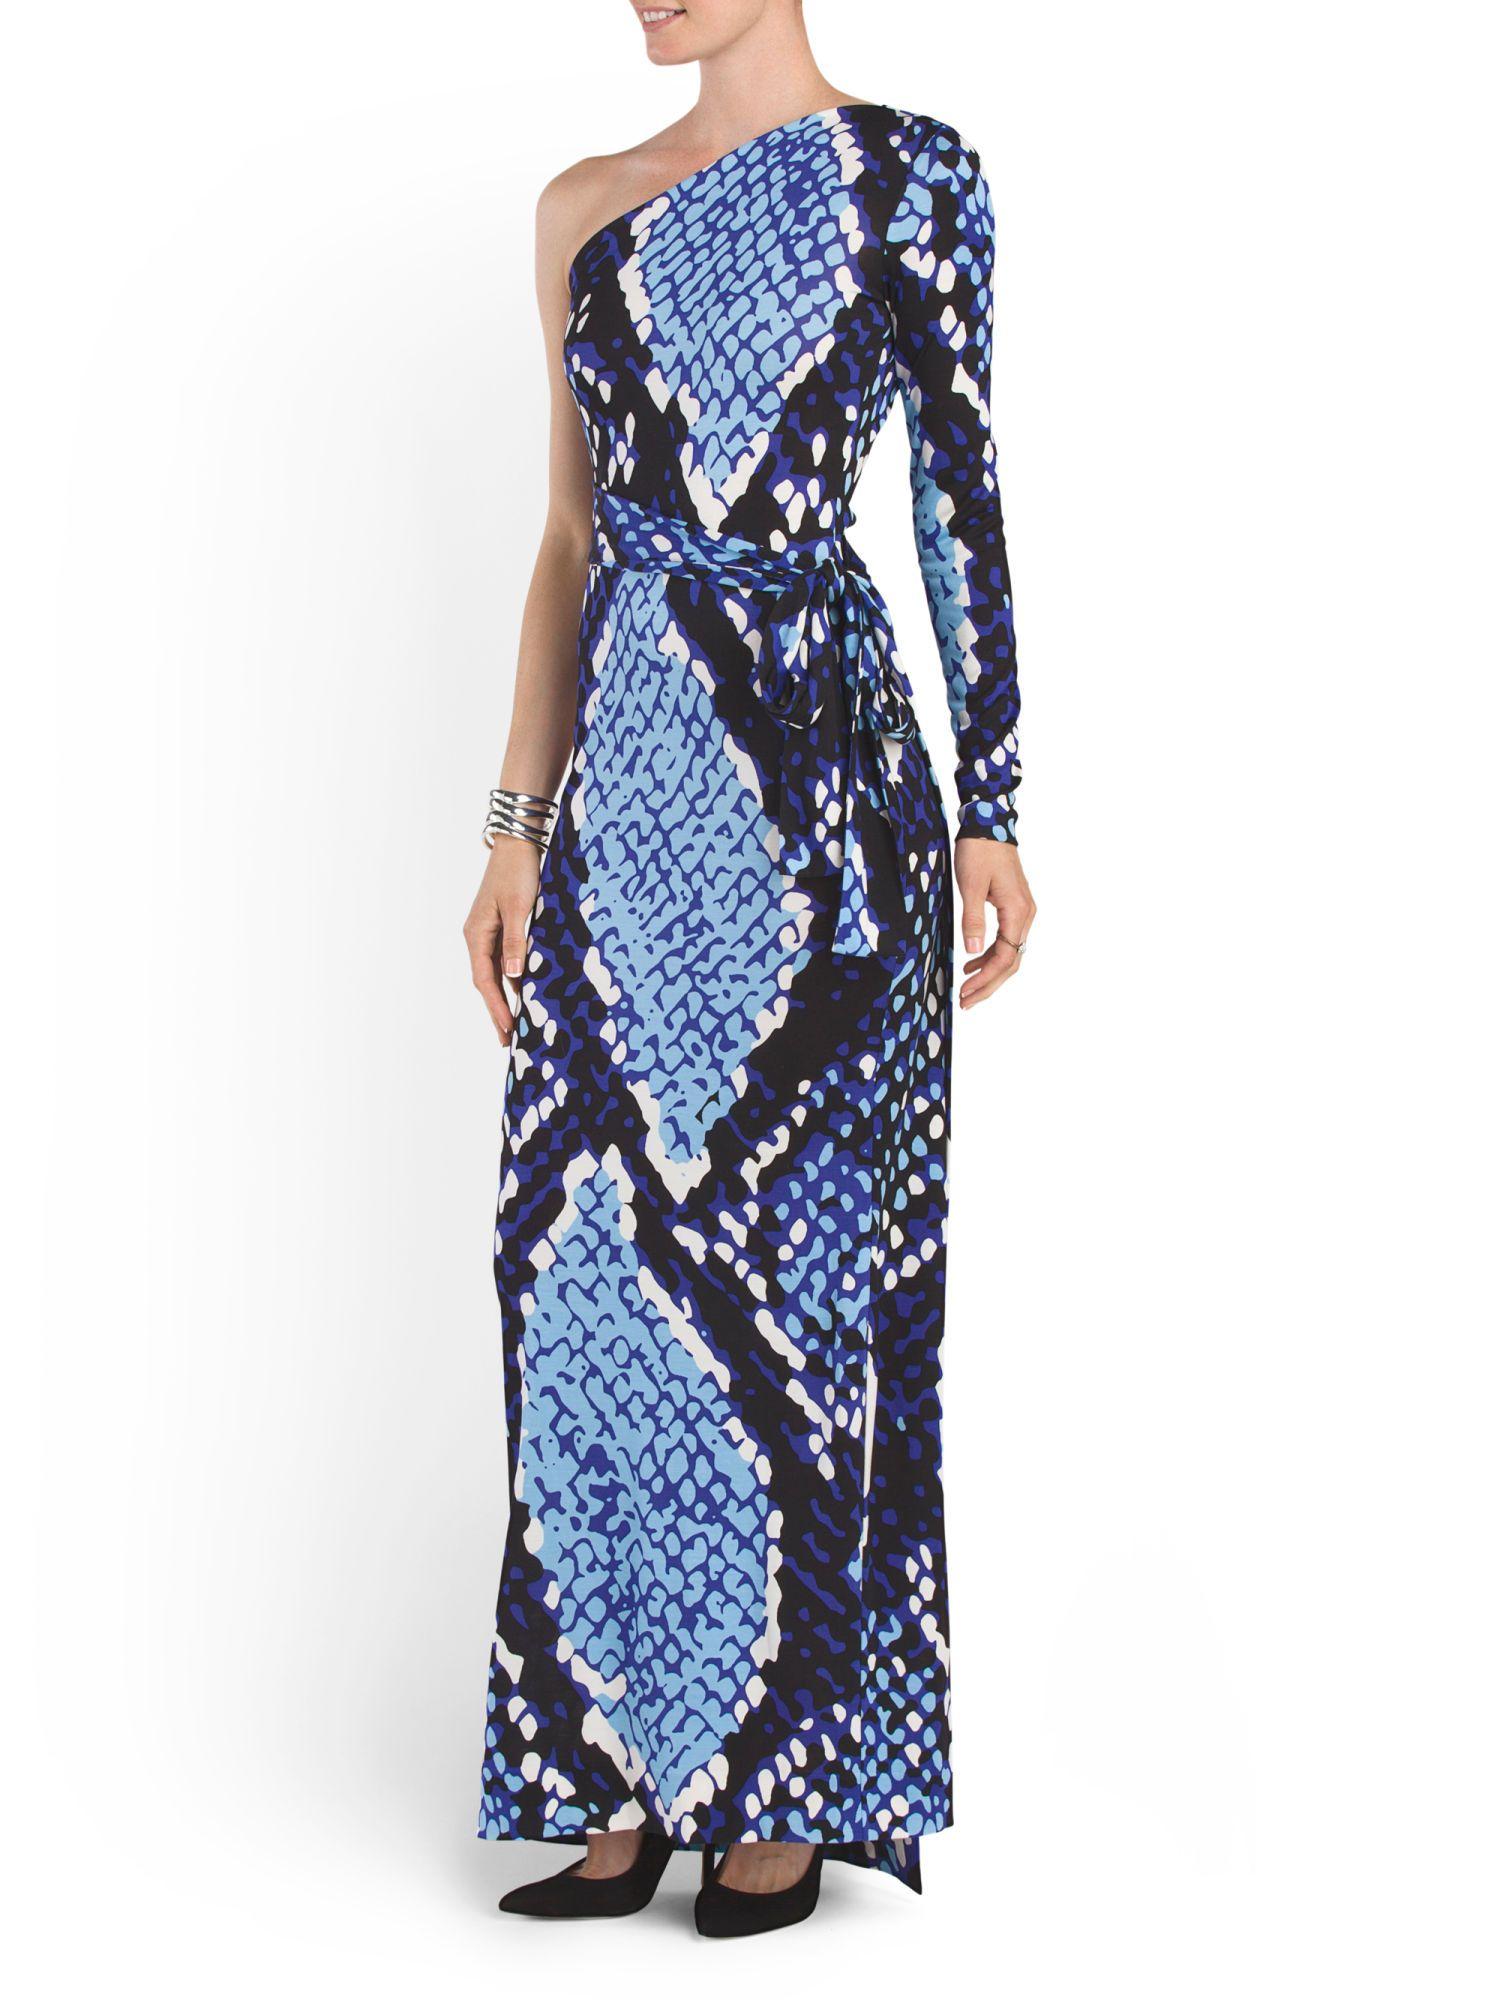 edc2a8a1 DIANE VON FURSTENBERG Silk Coco Maxi Dress | Browsing Fashion | Pinterest |  Dresses, Formal dresses and Dress outfits